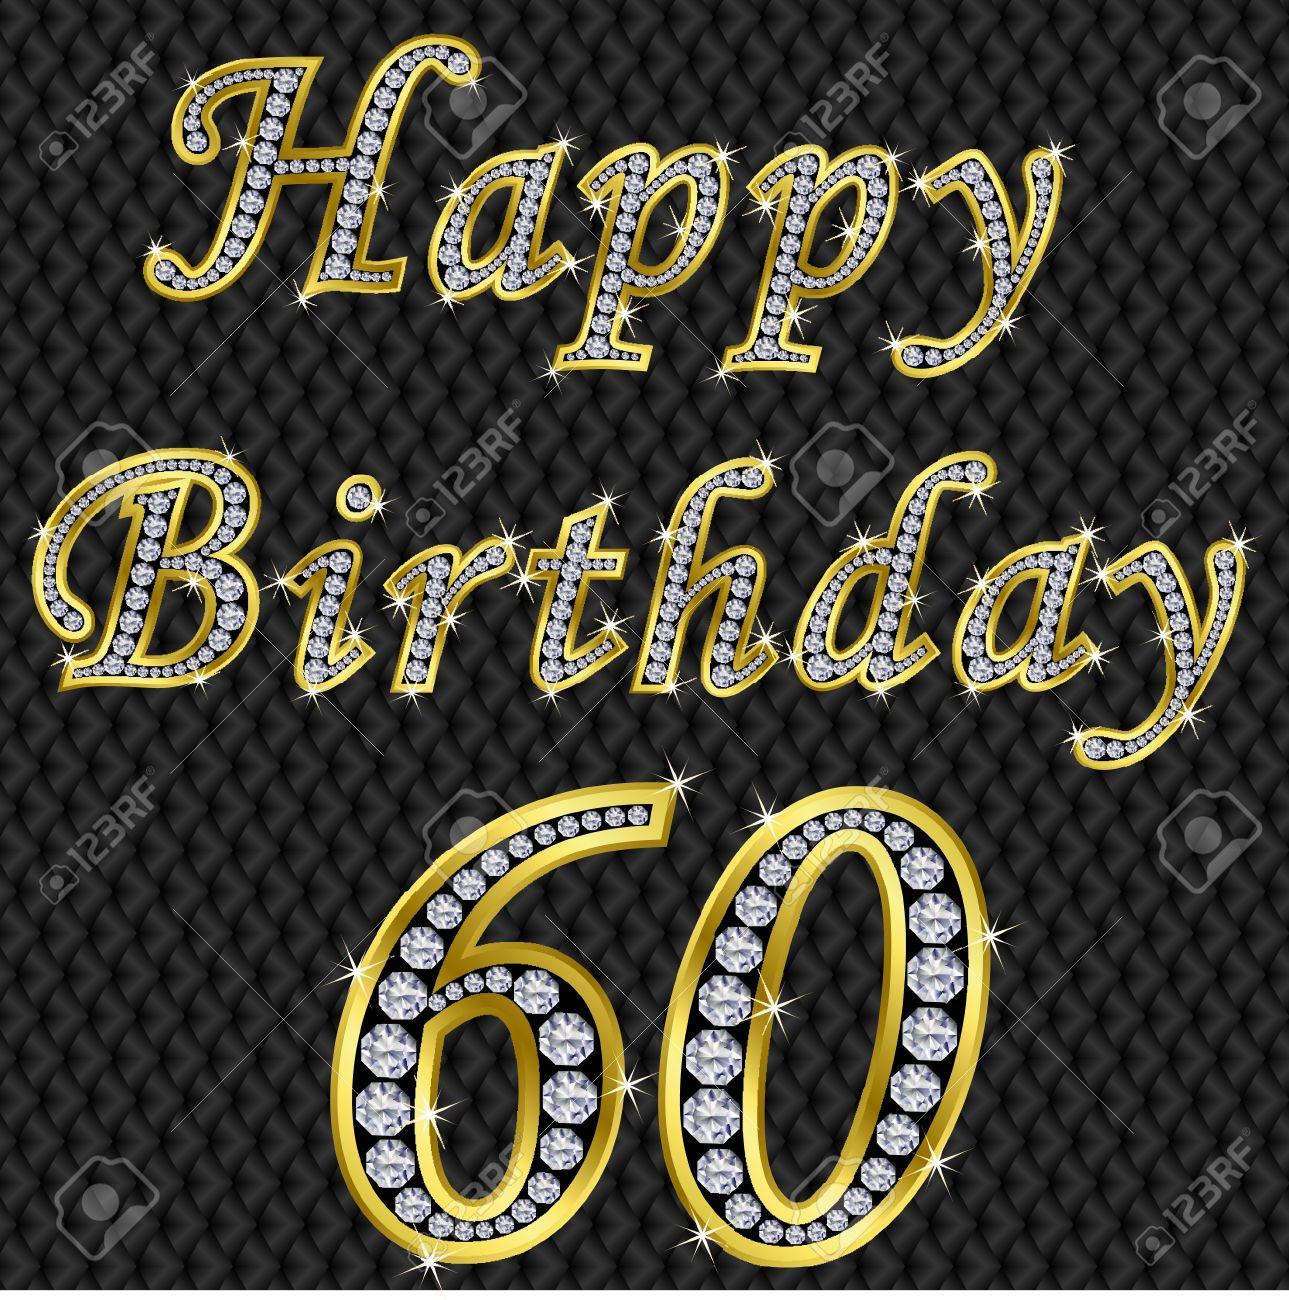 Happy 60 birthday, golden with diamonds, vector illustration Stock Vector - 11860295